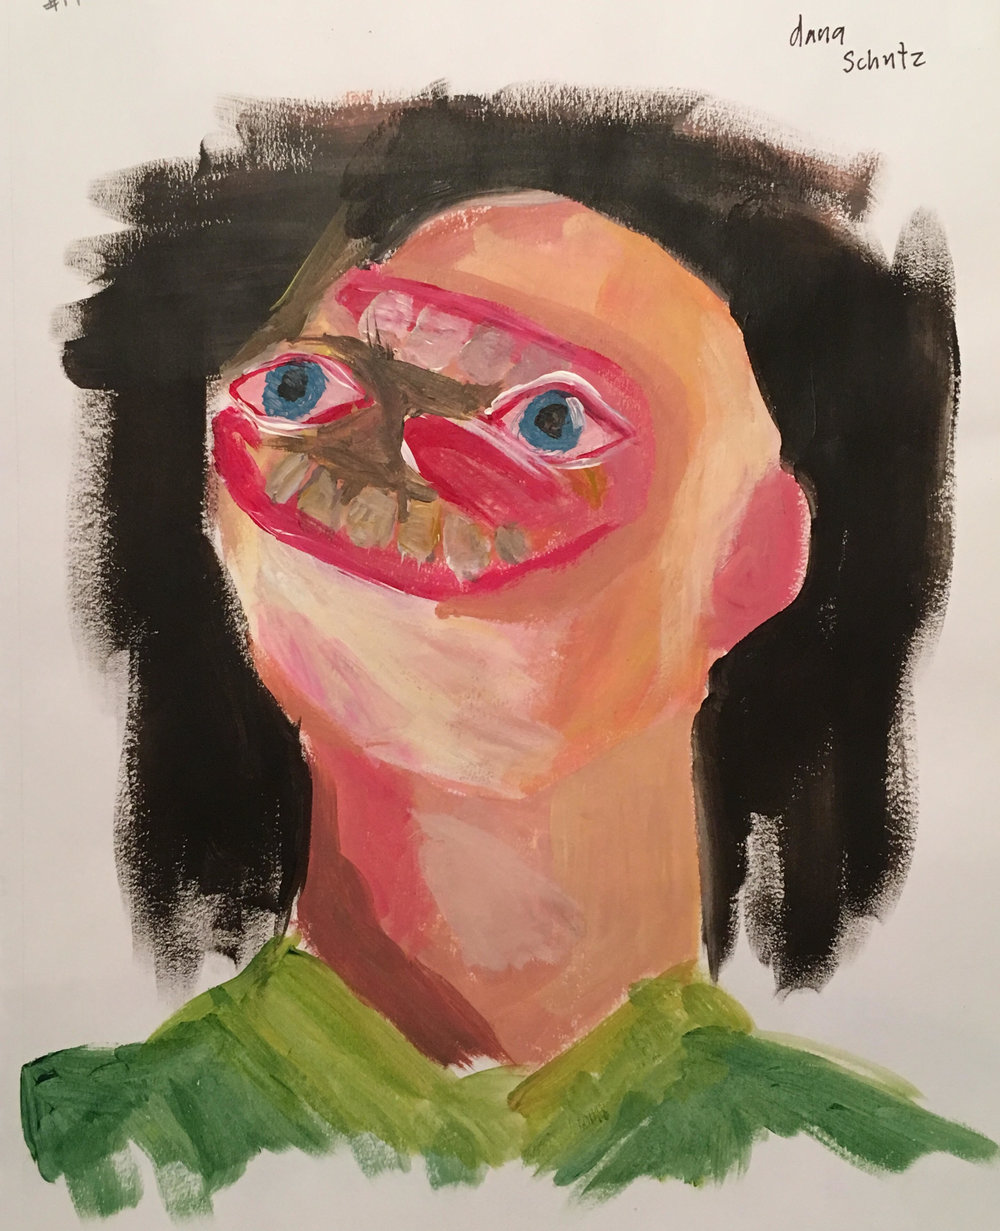 Artist copy (Dana Shutz) Acrylic on paper